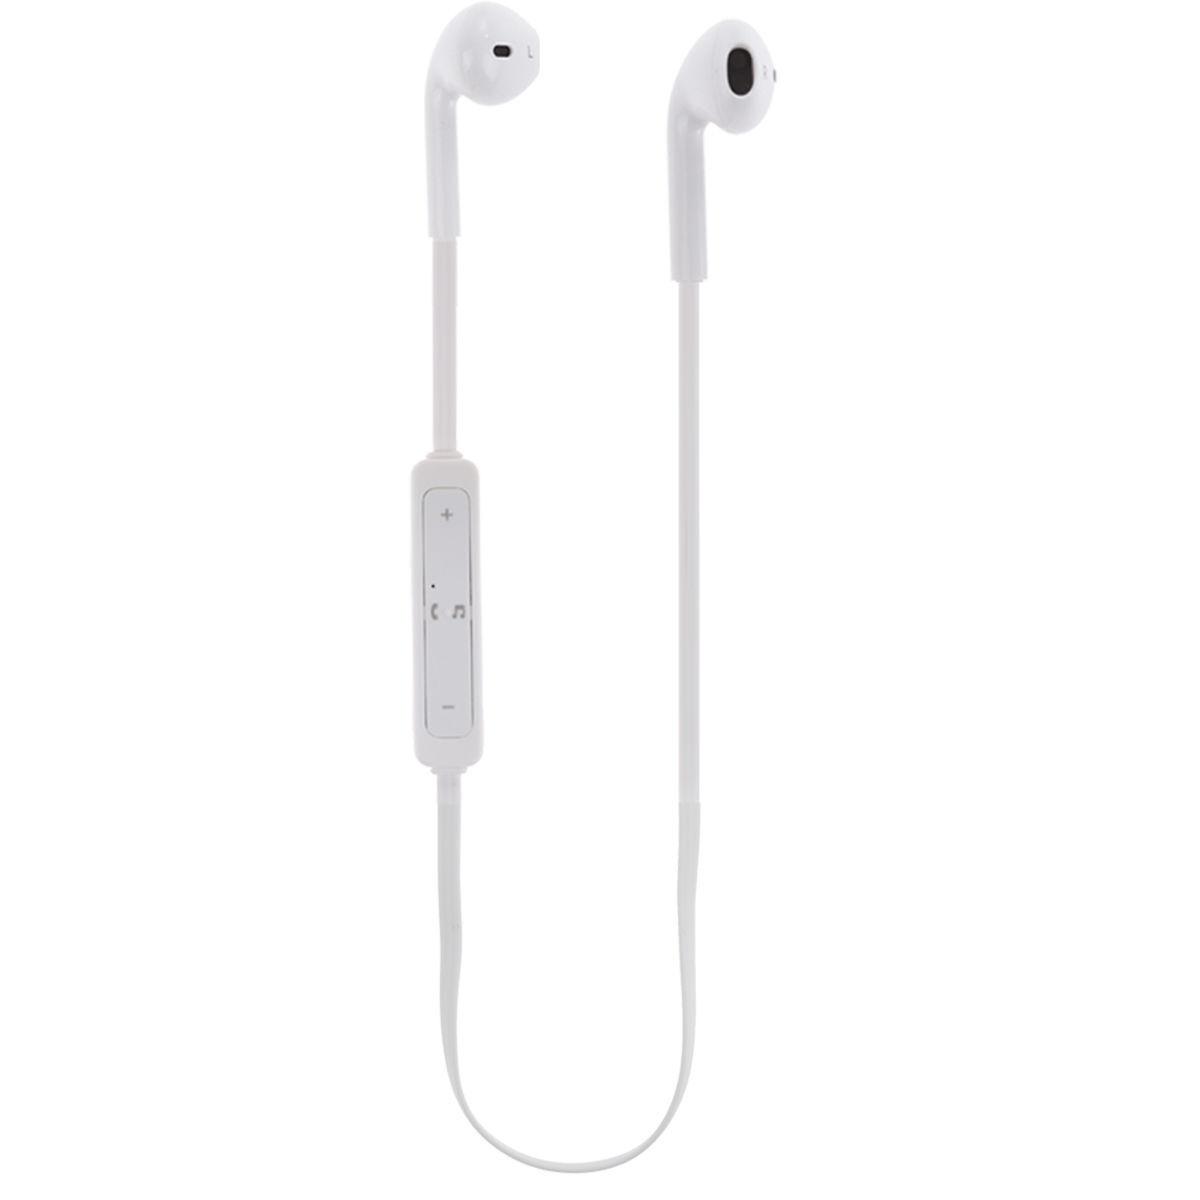 Wireless Bluetooth Headset Stereo Headphone Earphone Sport for iPhone Samsung LG